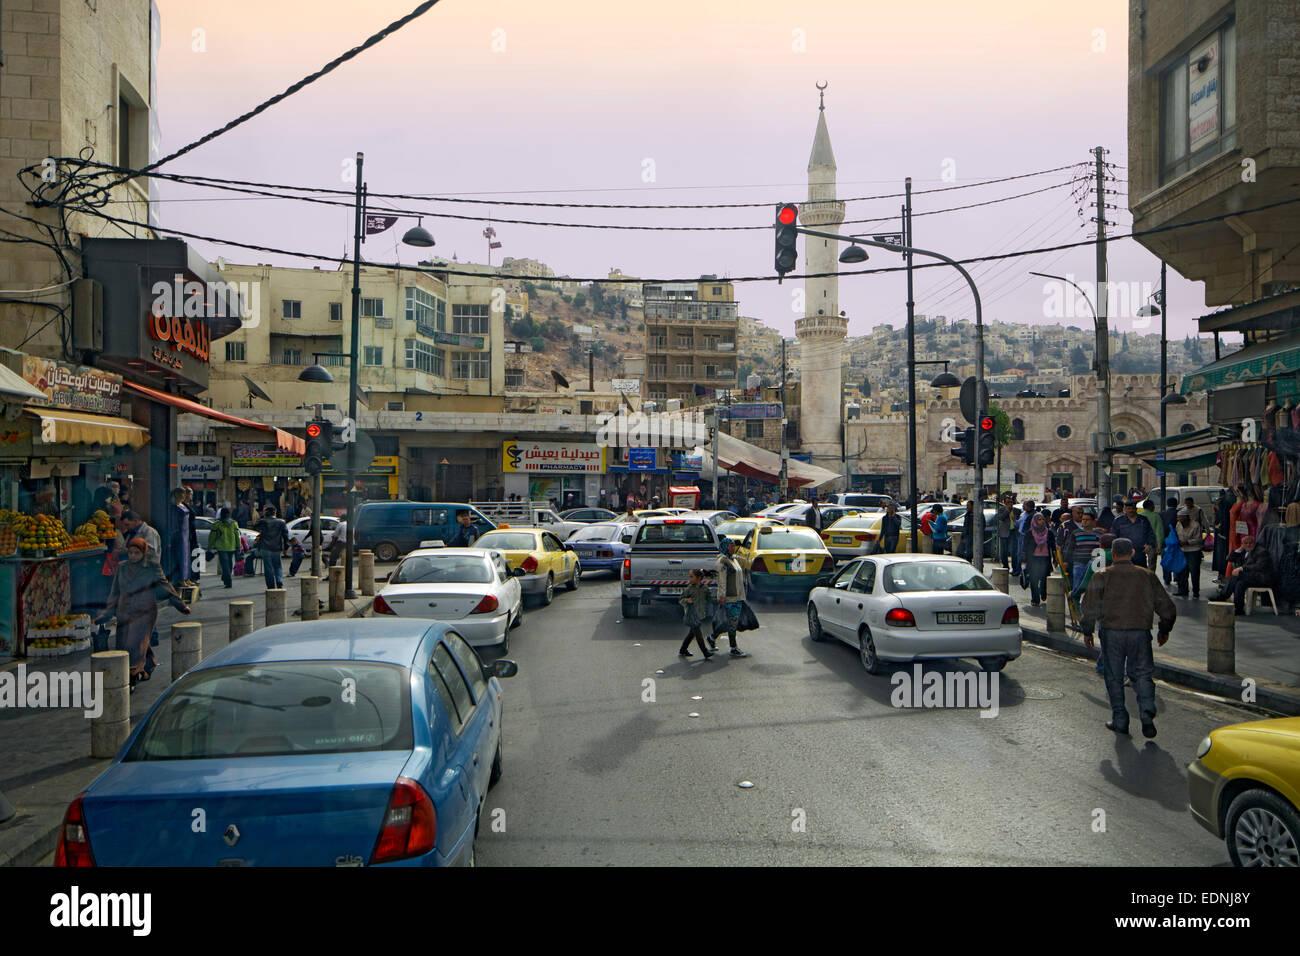 Straßenszene, Straße, Moschee, Amman, Jordanien Stockbild